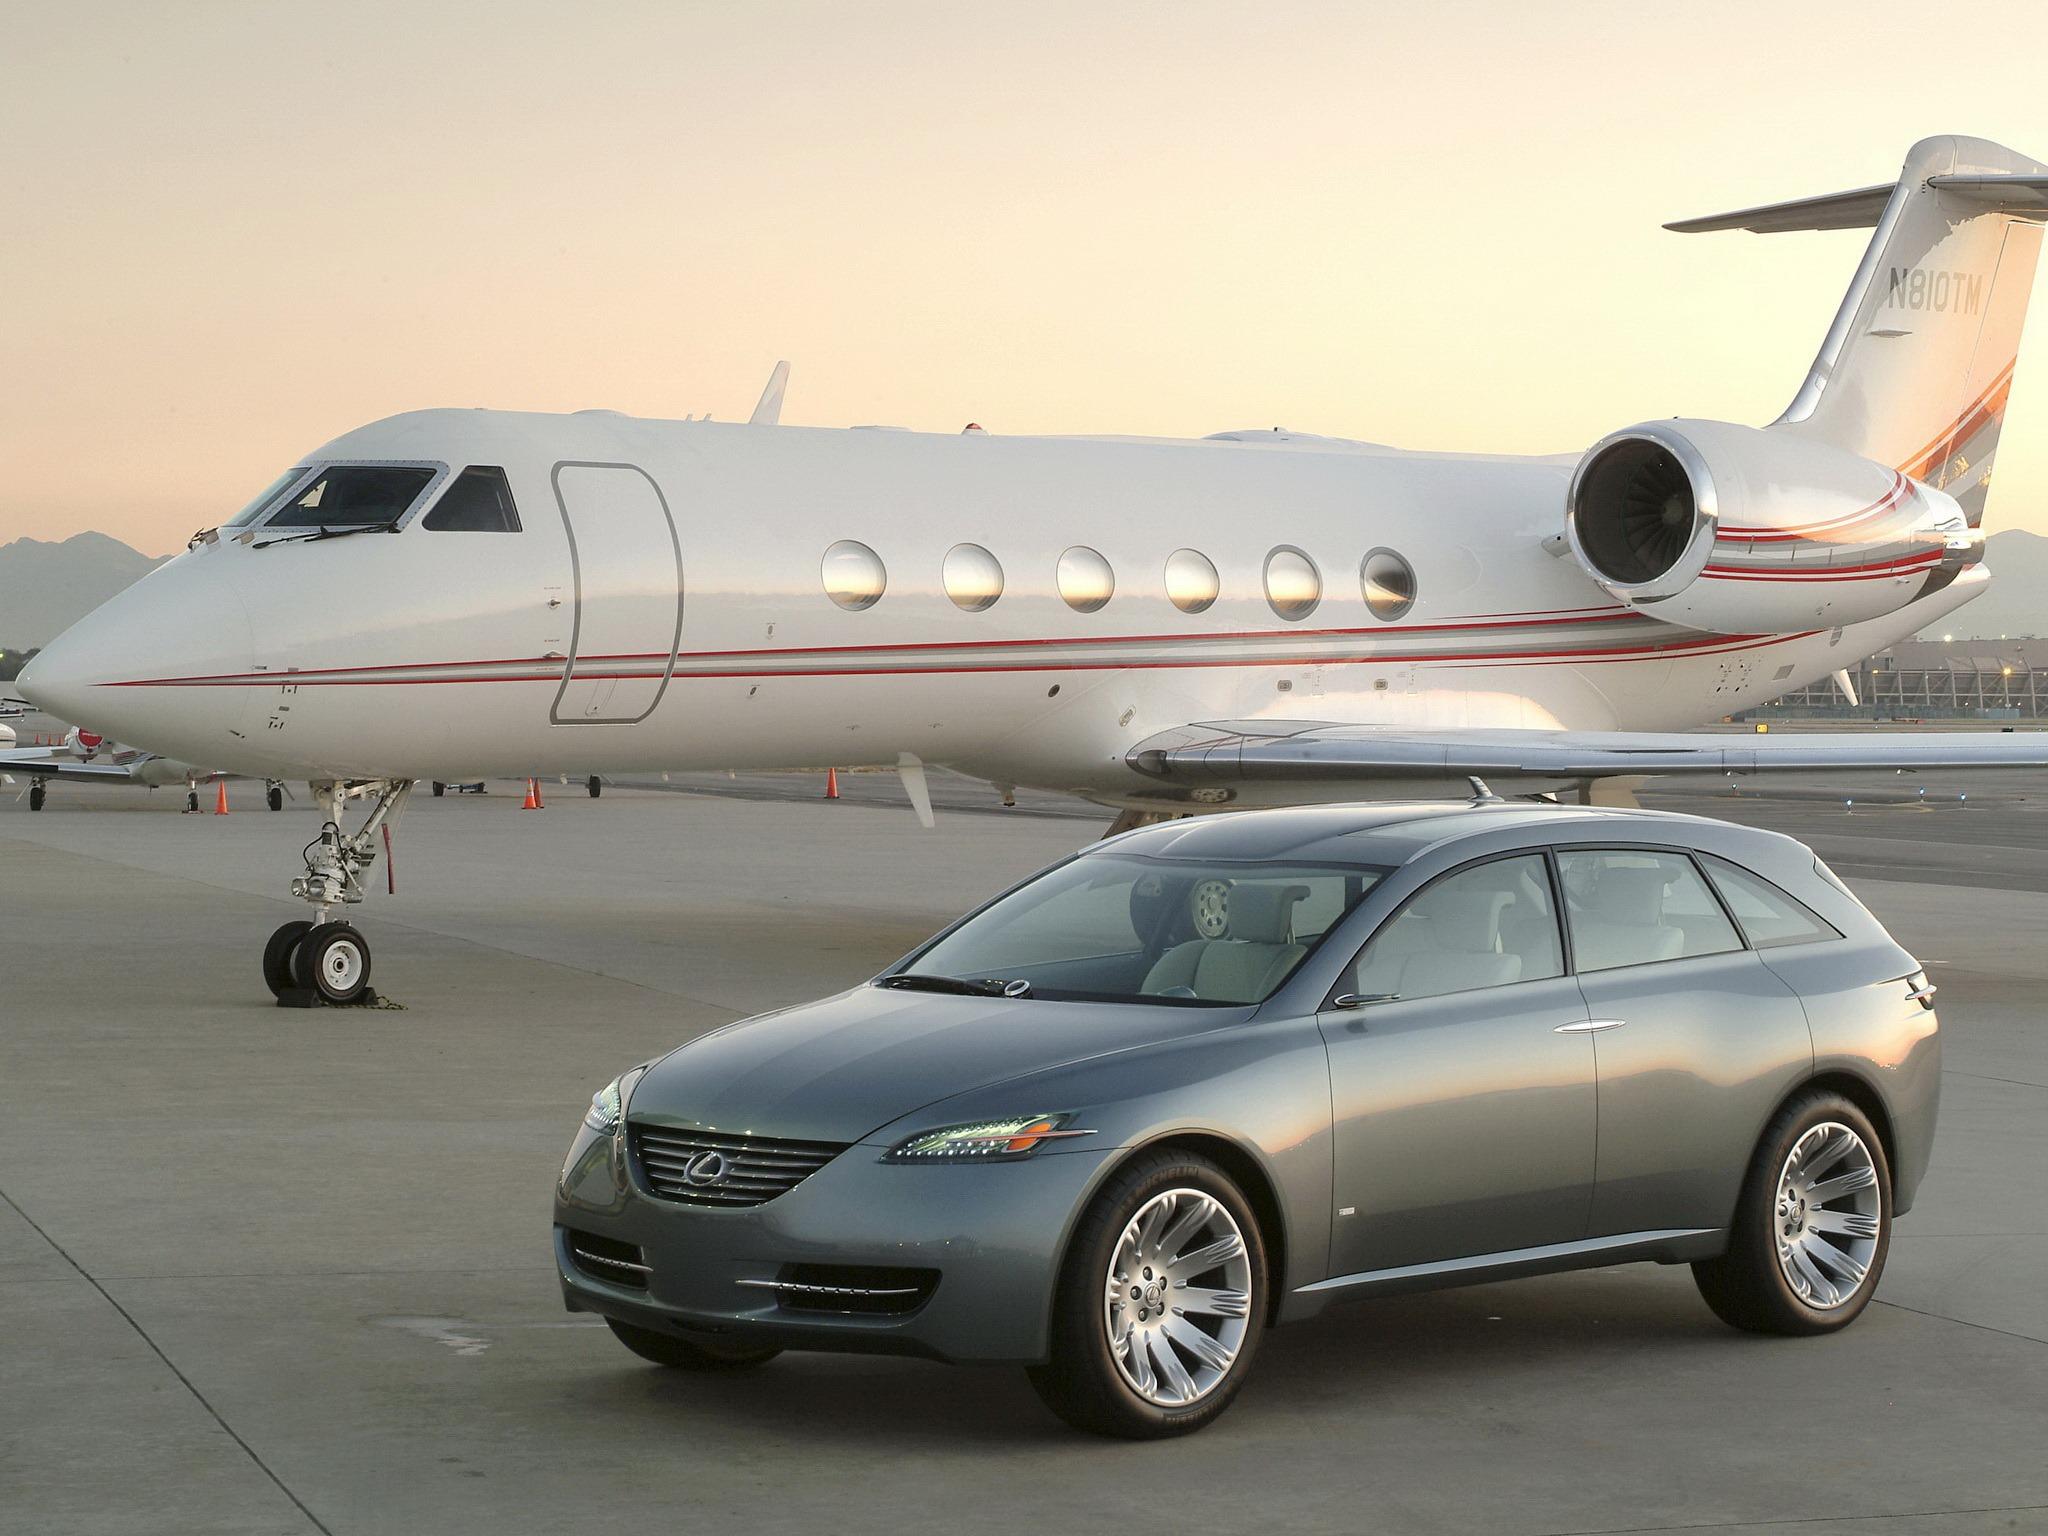 Subaru Dealer Near Me >> Lexus HPX Concept (2003) - Old Concept Cars